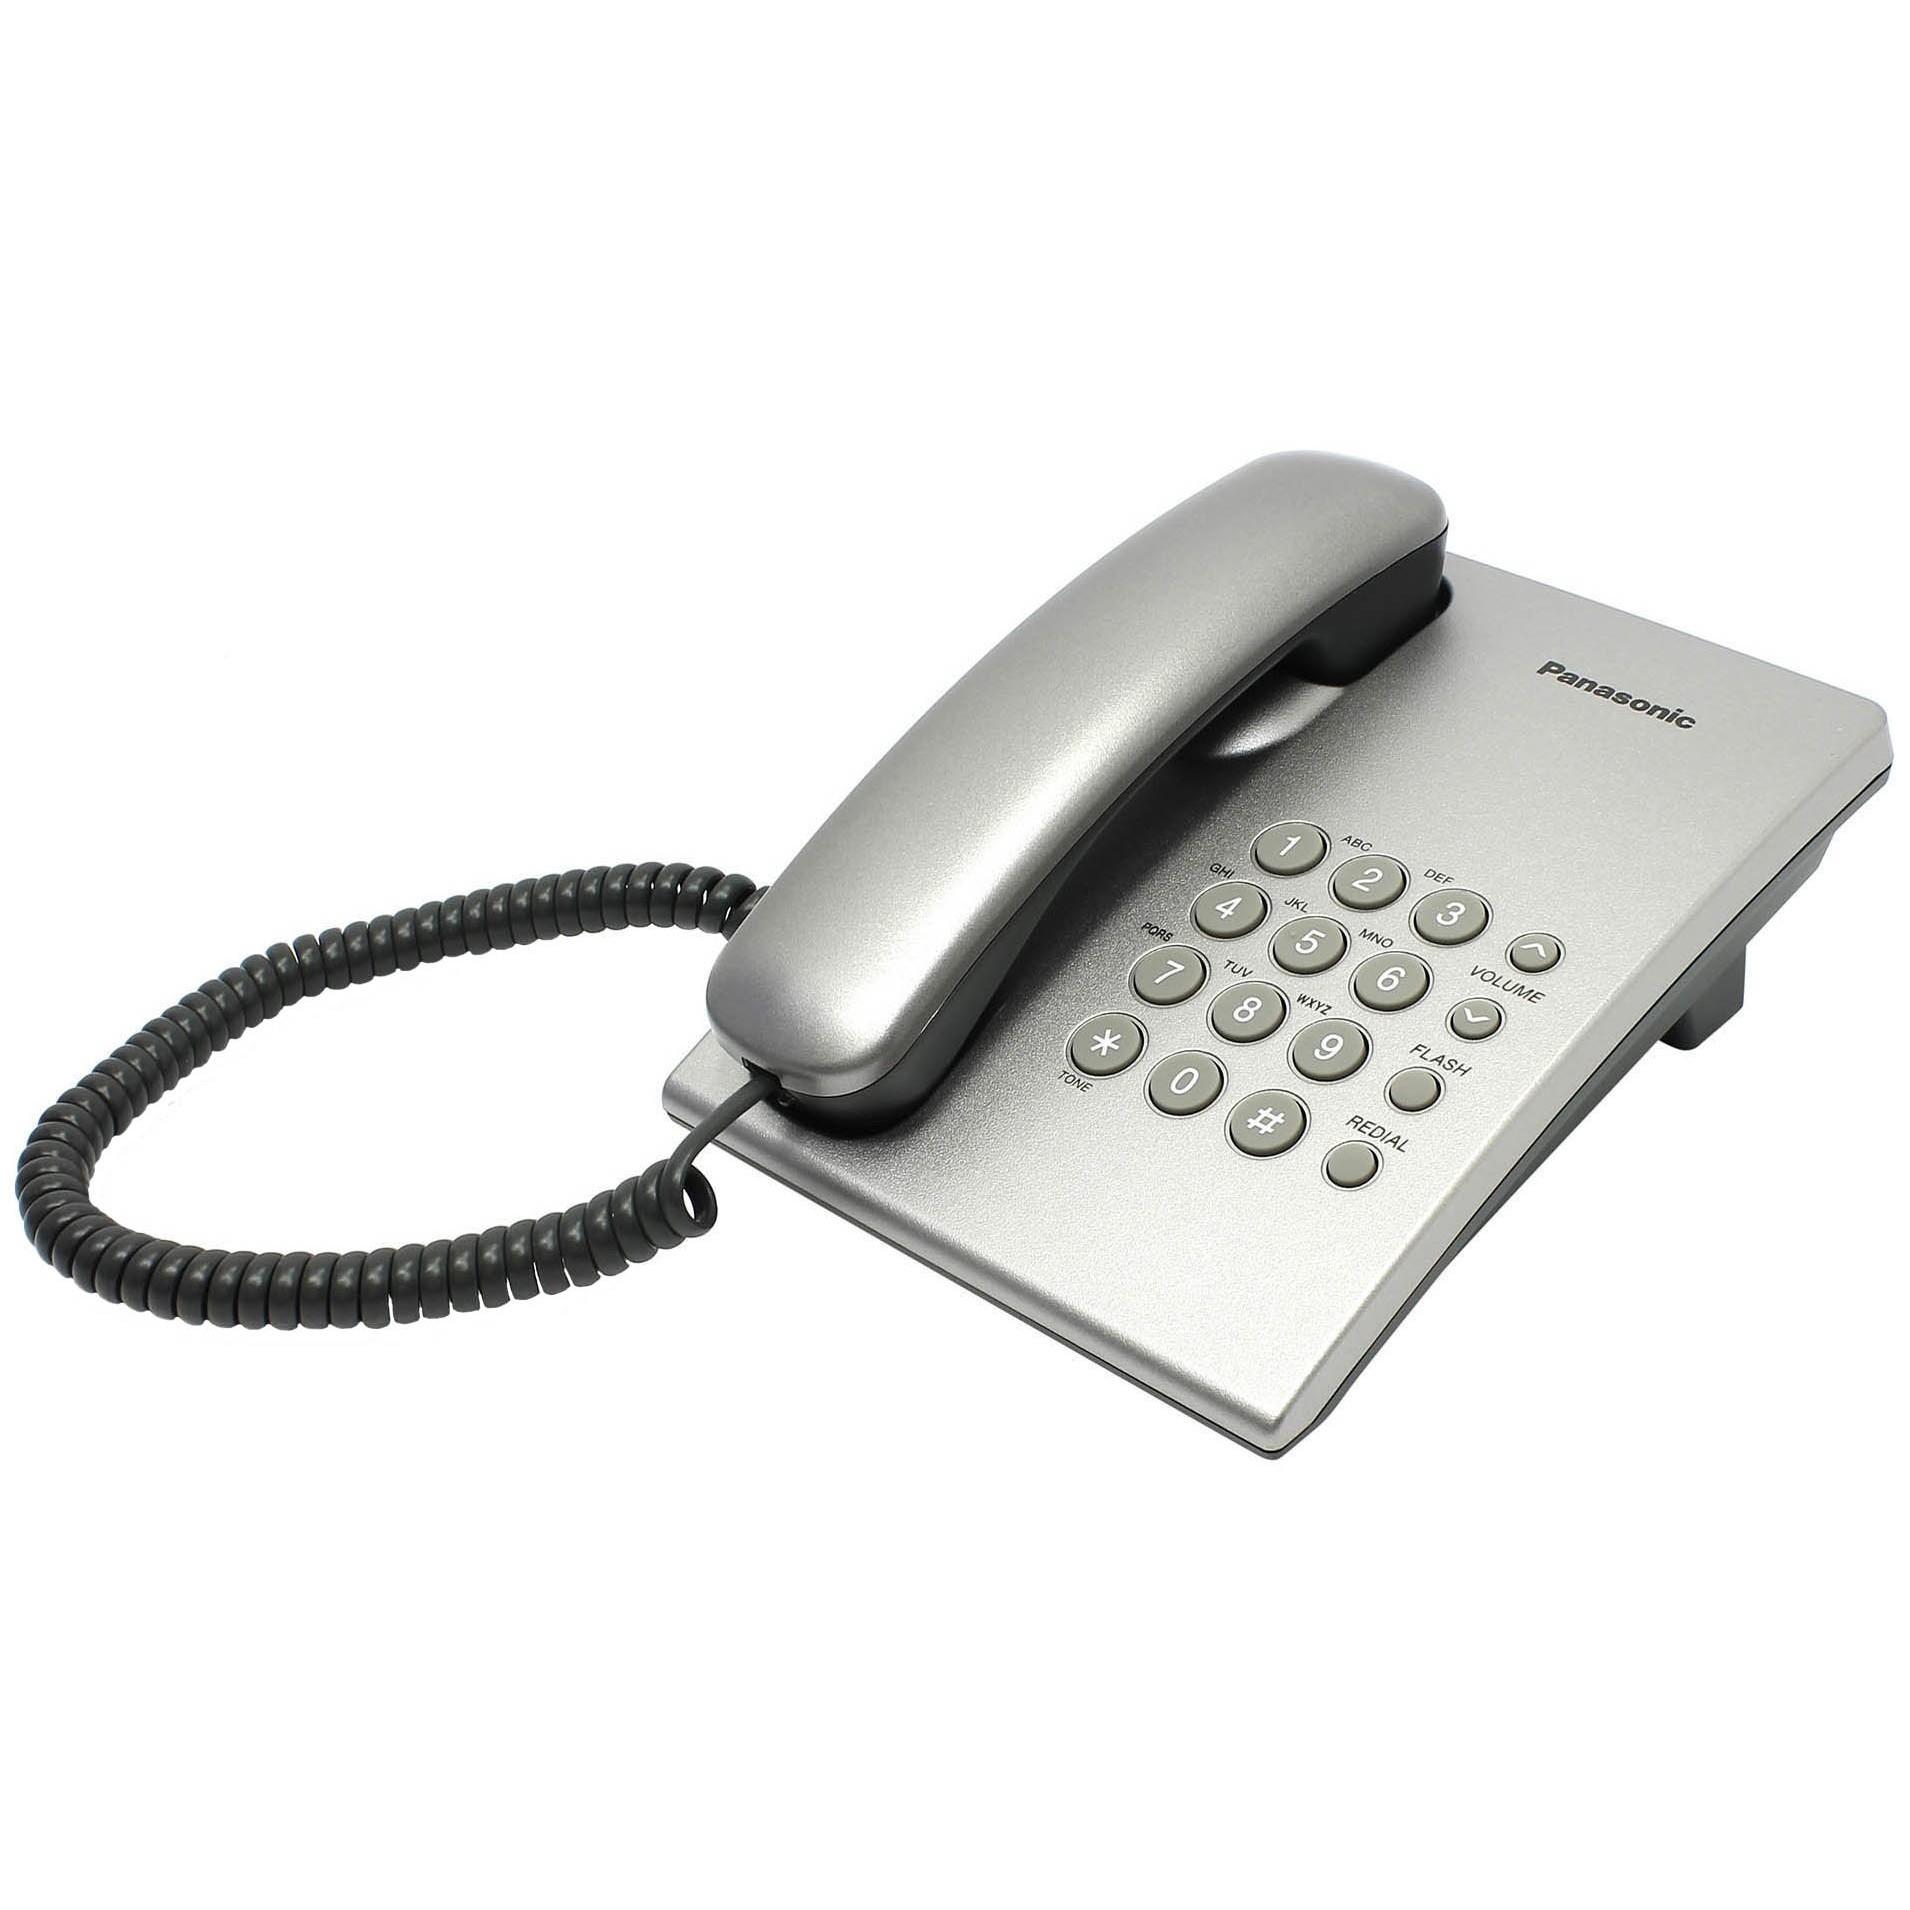 Проводной телефон Panasonic KX-TS2350 (серебристый)